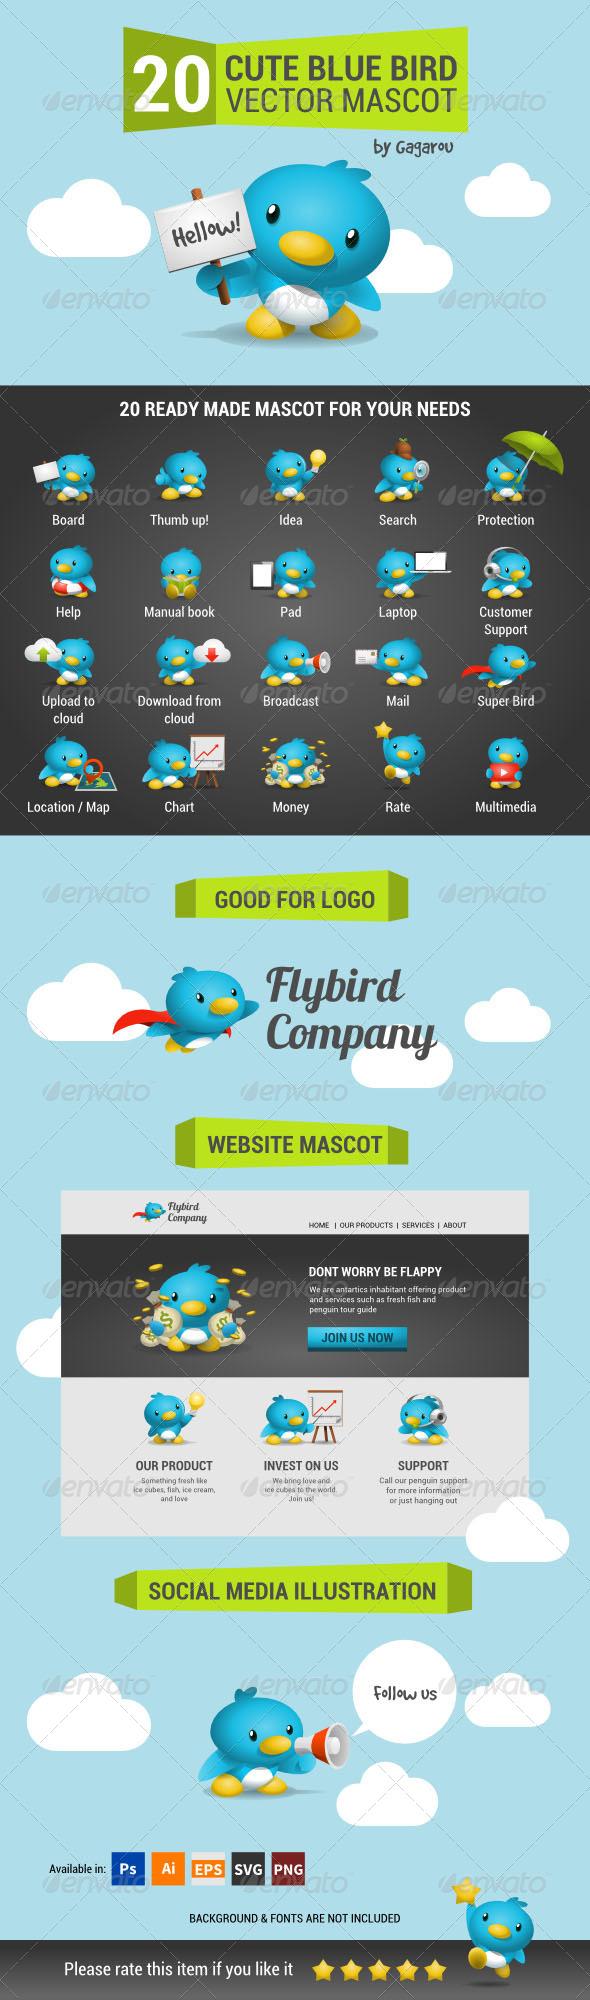 GraphicRiver Cute Blue Bird Mascot Pack 7526596